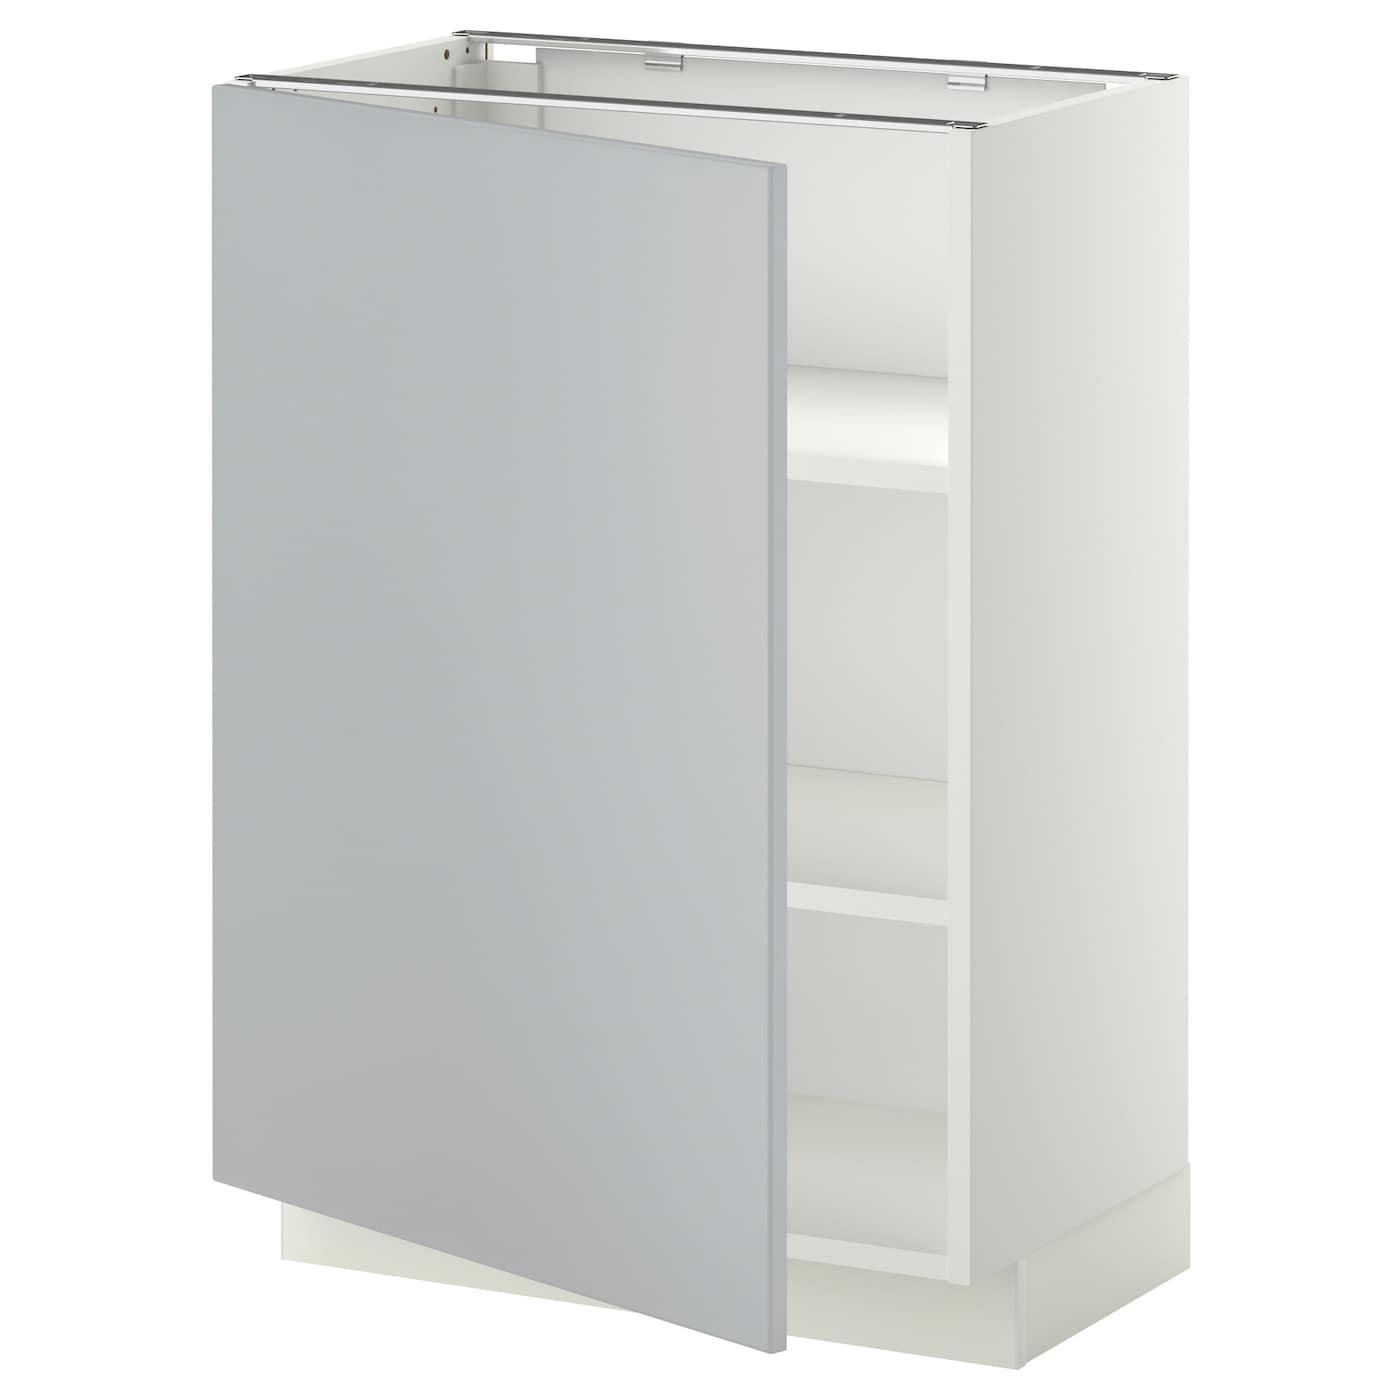 Metod base cabinet with shelves white veddinge grey 60x37 for Ikea base cabinets